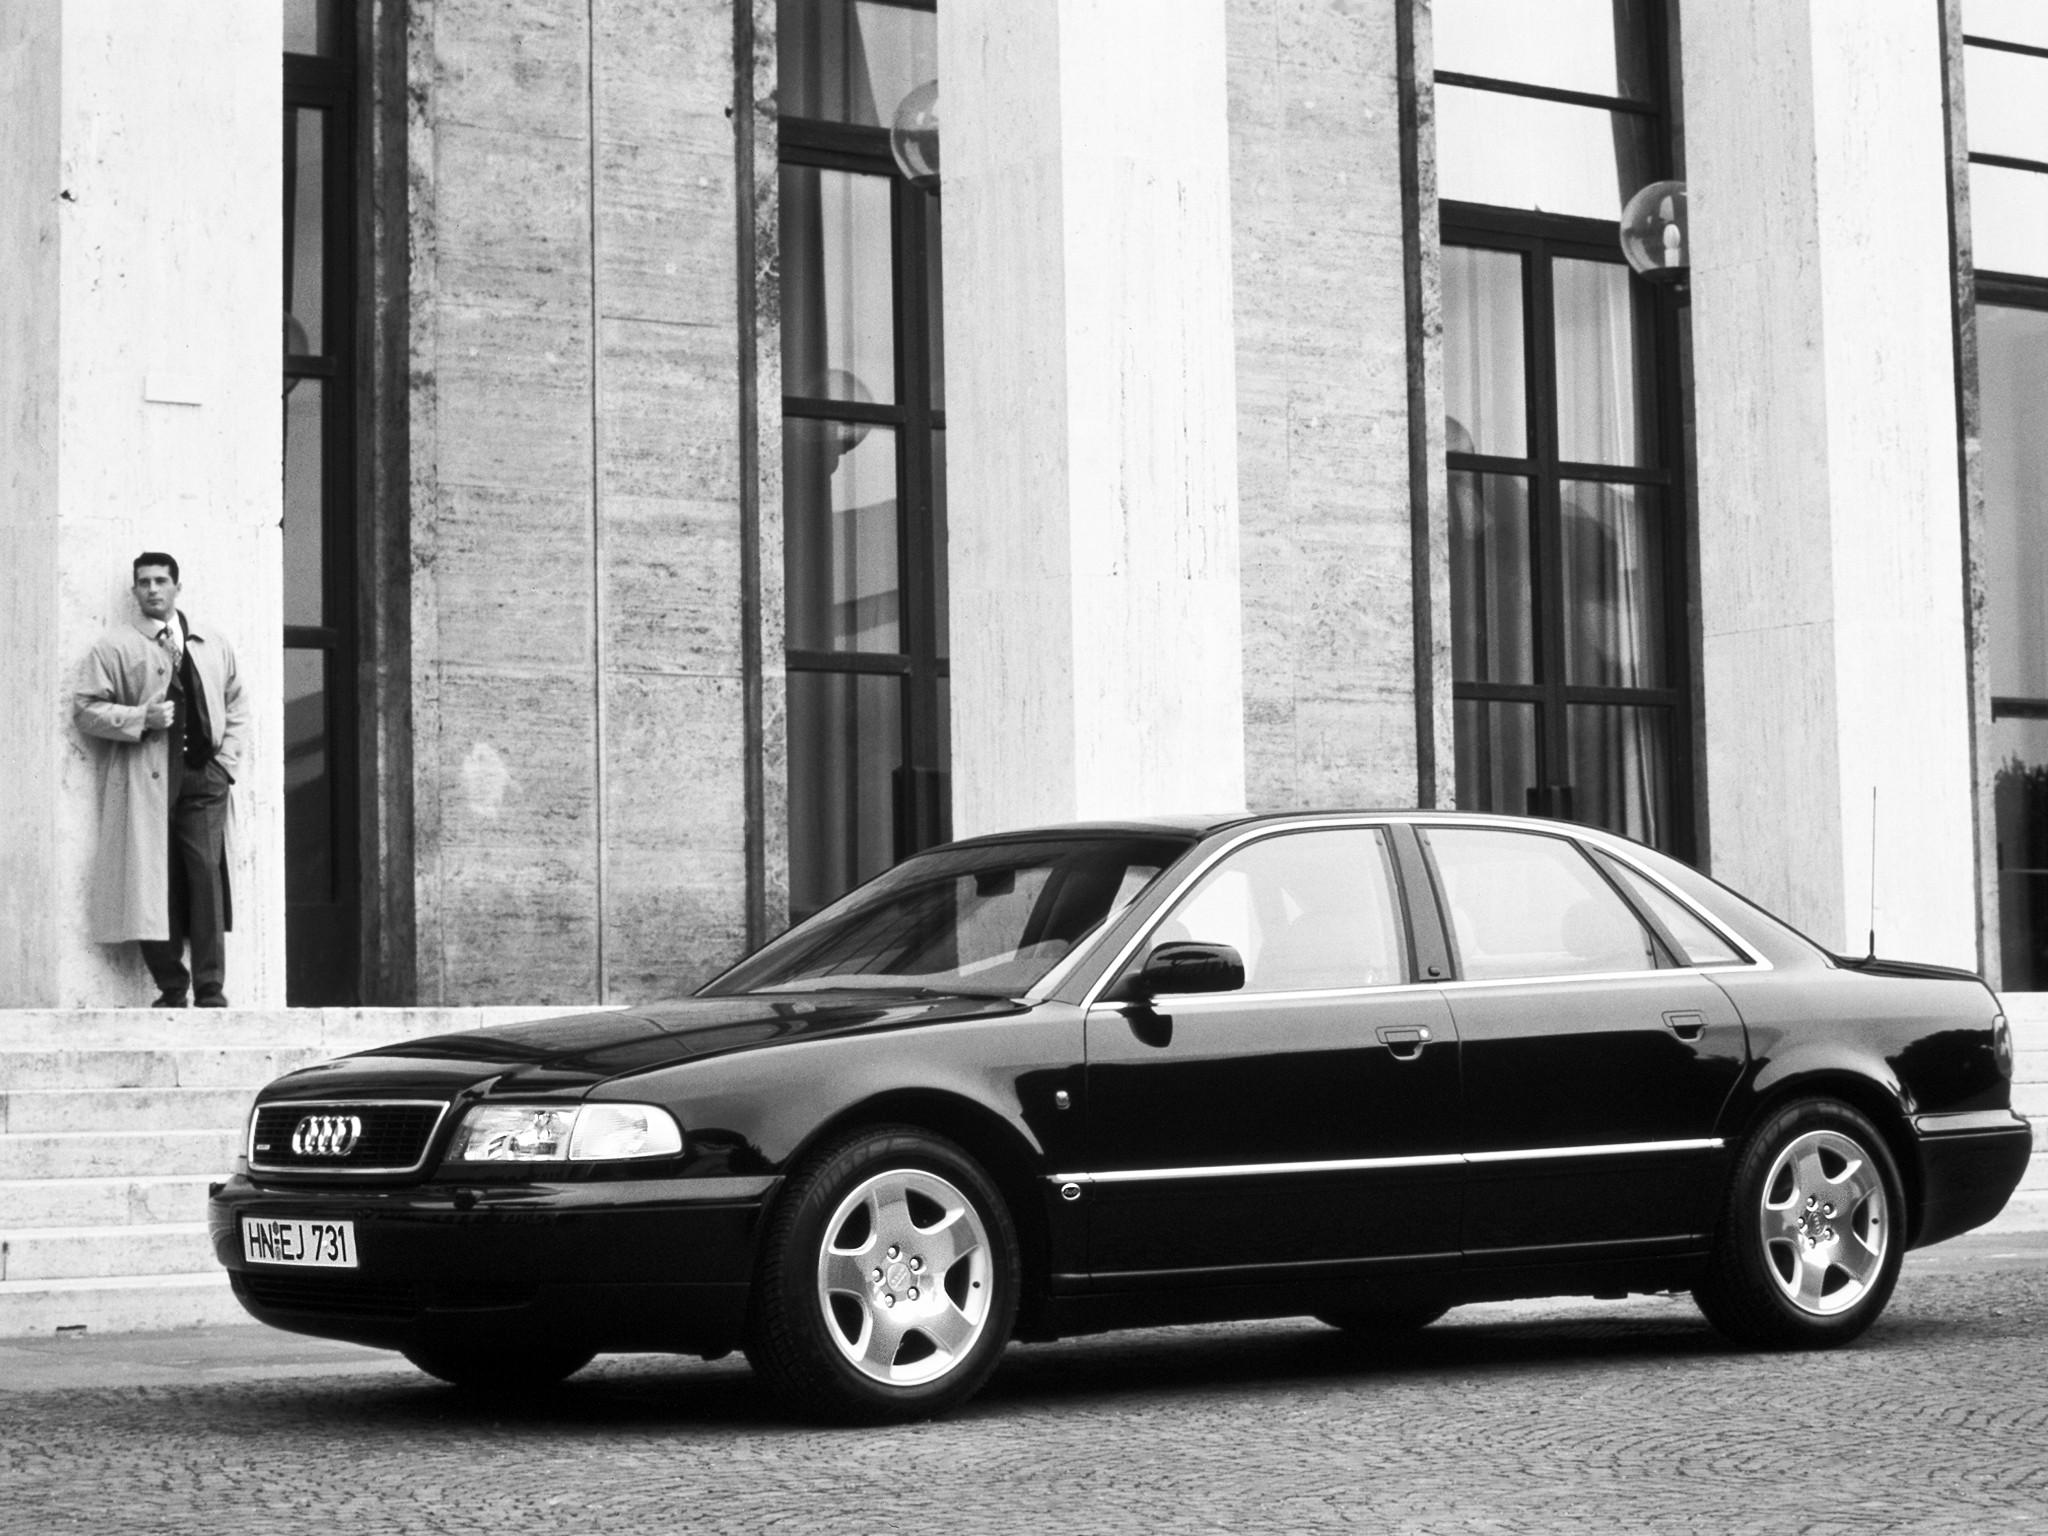 Audi A8 D2 Specs Photos 1994 1995 1996 1997 1998 1999 A4 Radio Wiring Diagram 2008 42 Tdi Quattro